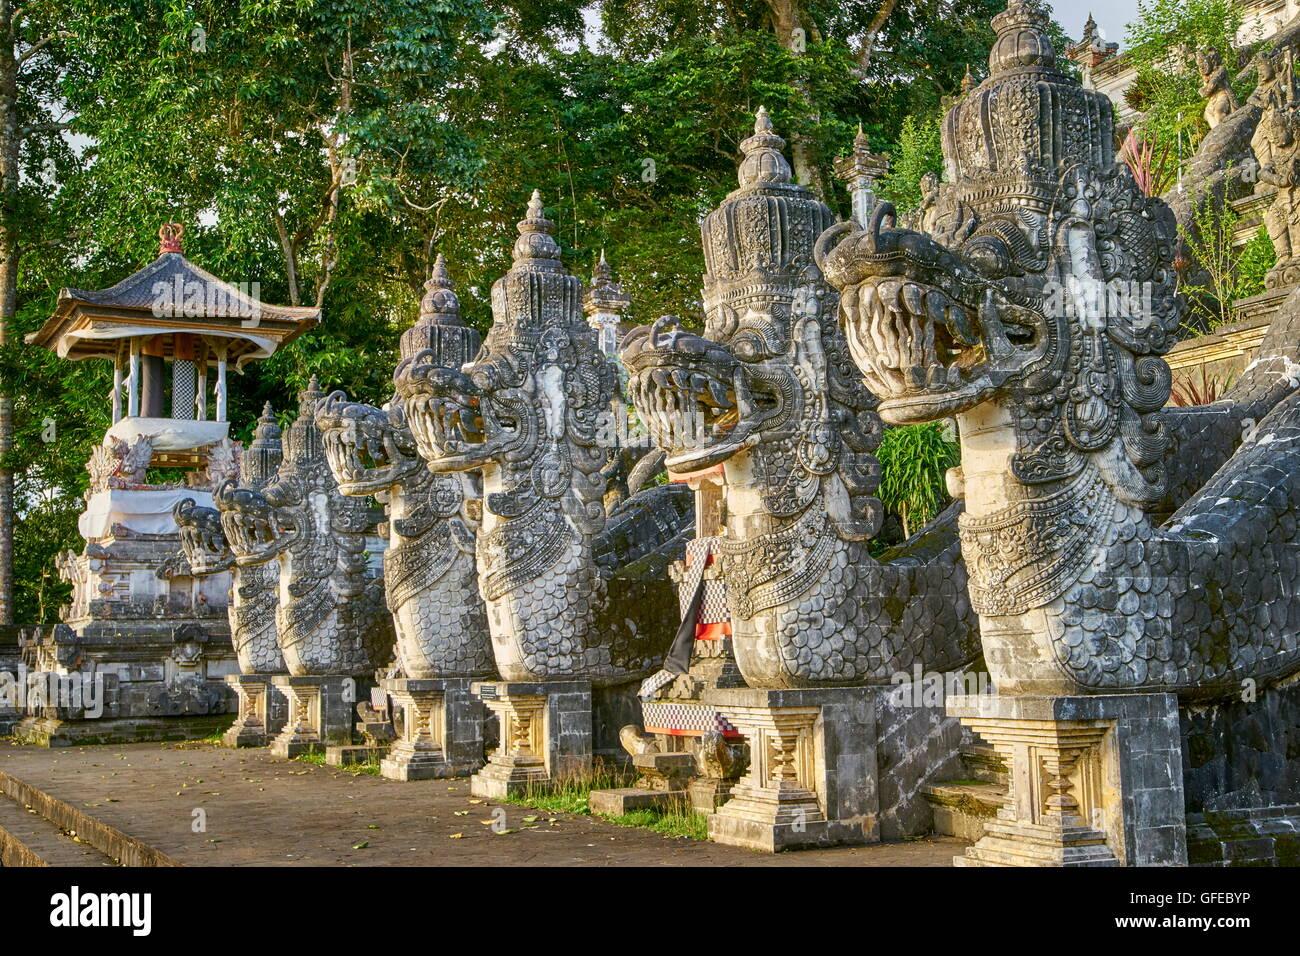 Visages de dragons en face de Pura Penataran Temple de Lempuyang, Bali, Indonésie Photo Stock